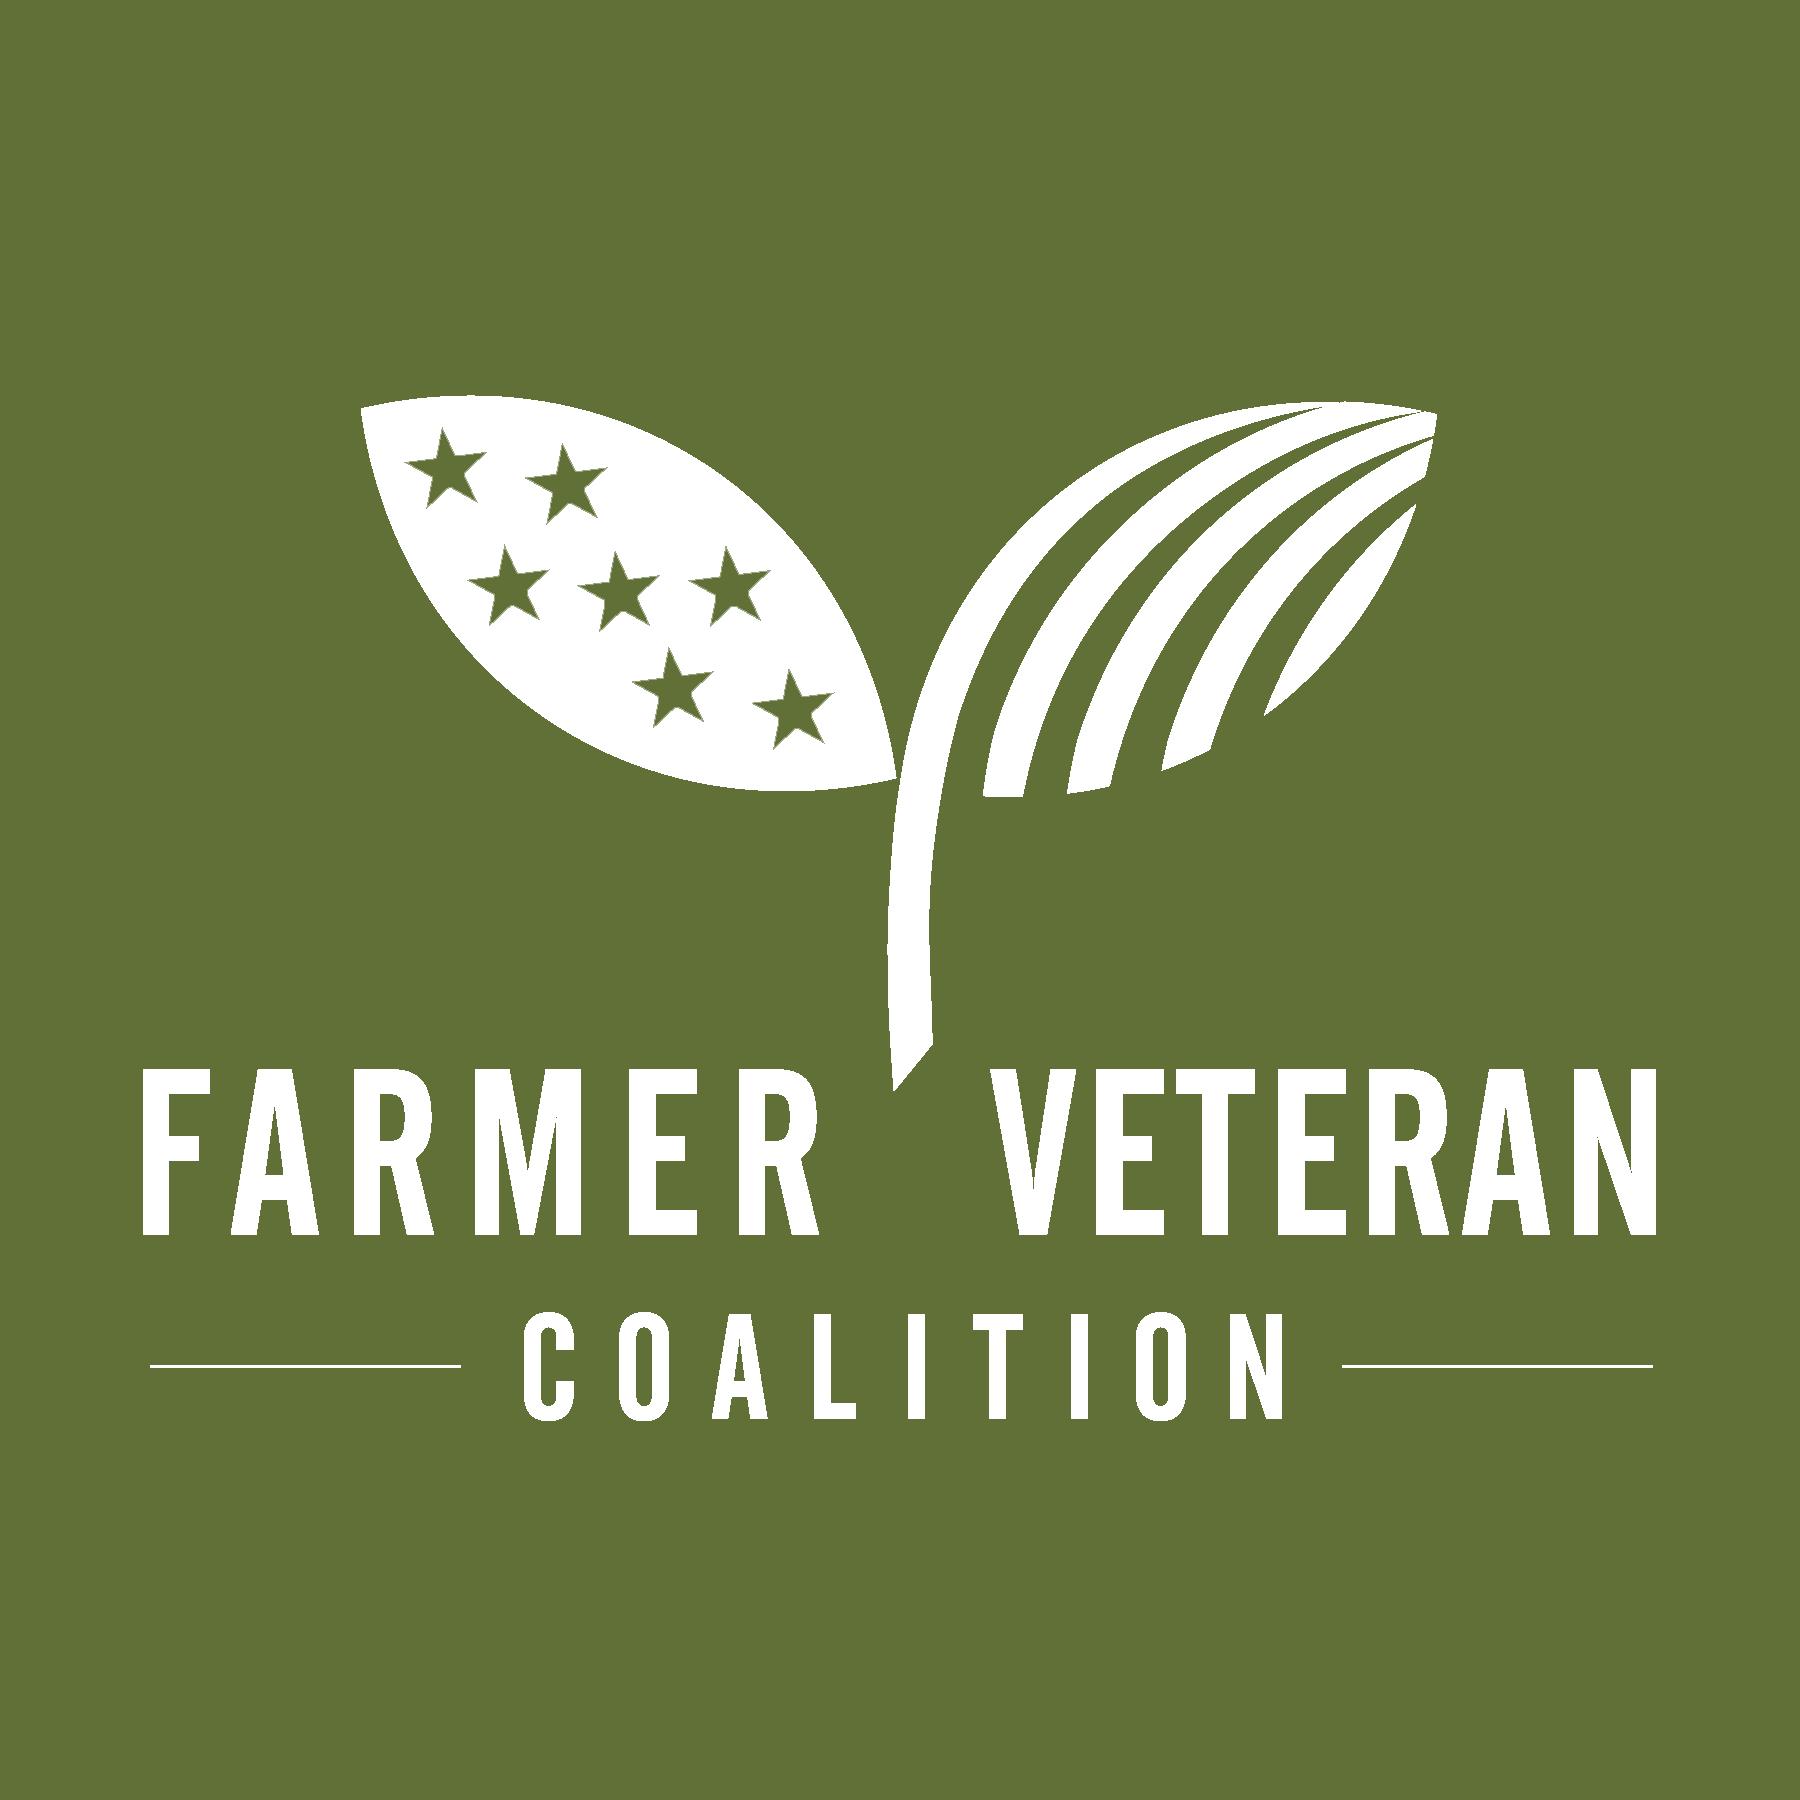 FarmerVeteranCo_greenandwhite.png